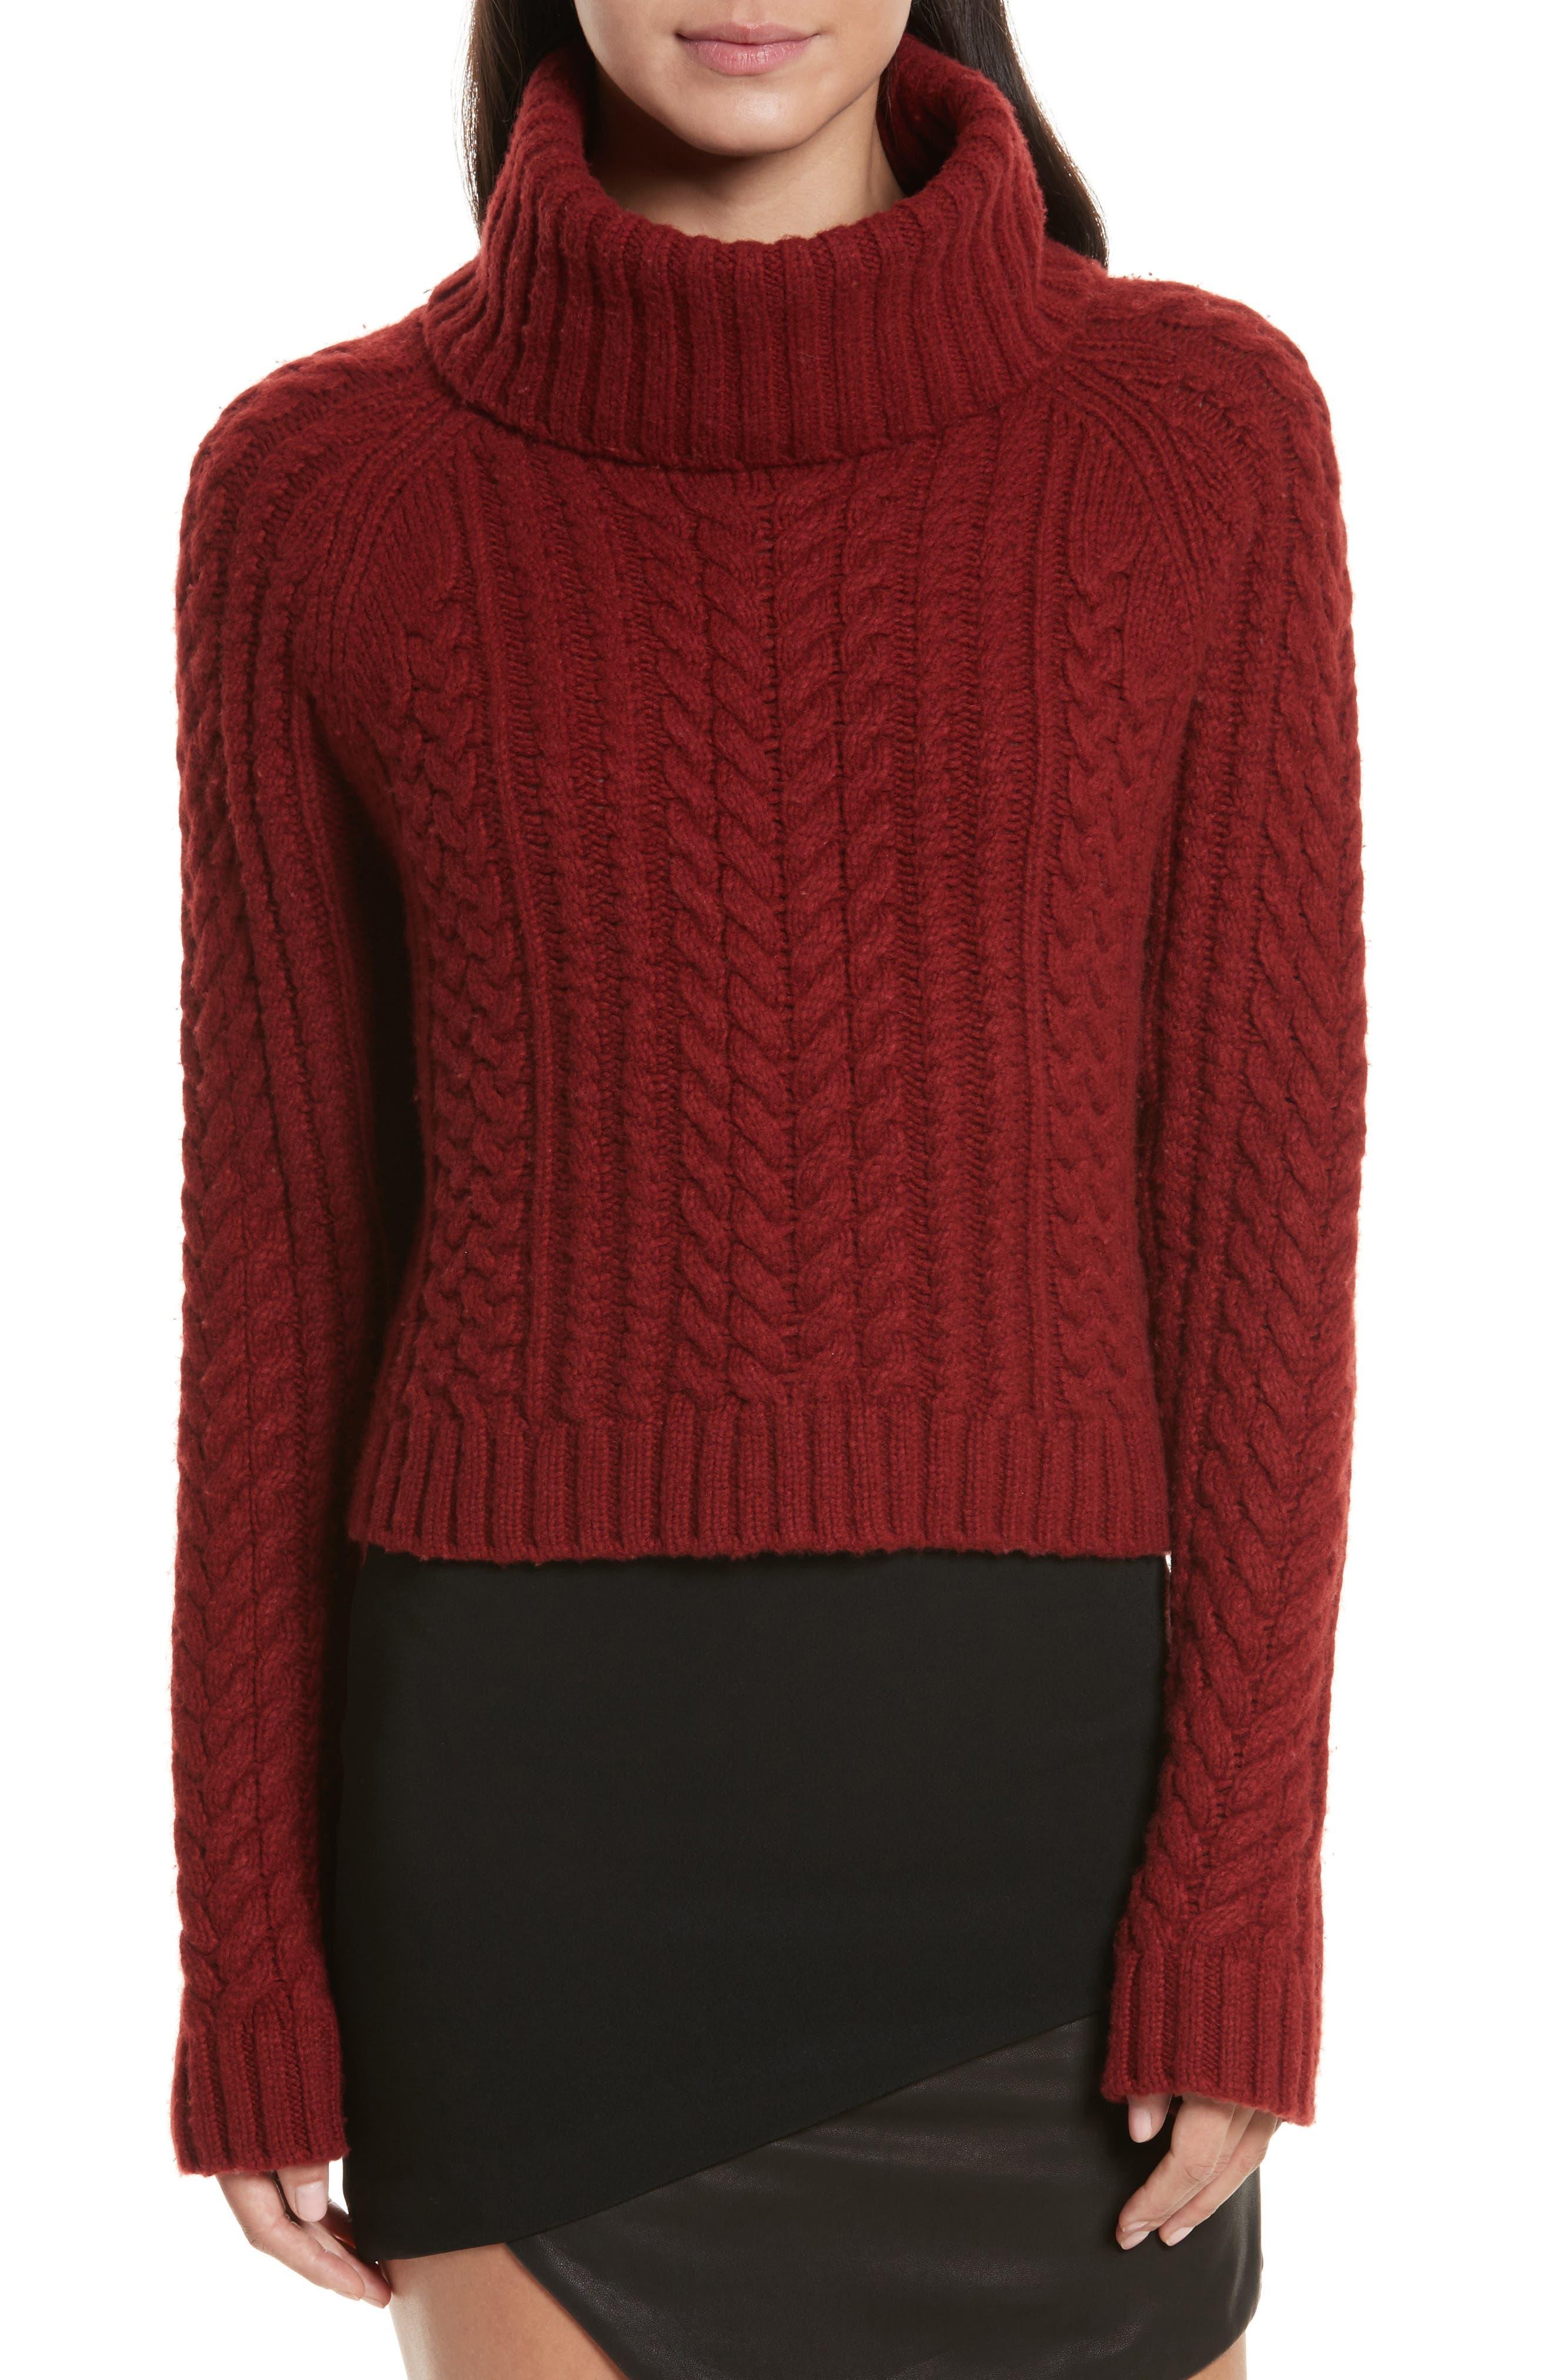 Tobin Cable Knit Crop Turtleneck Sweater,                             Main thumbnail 1, color,                             939